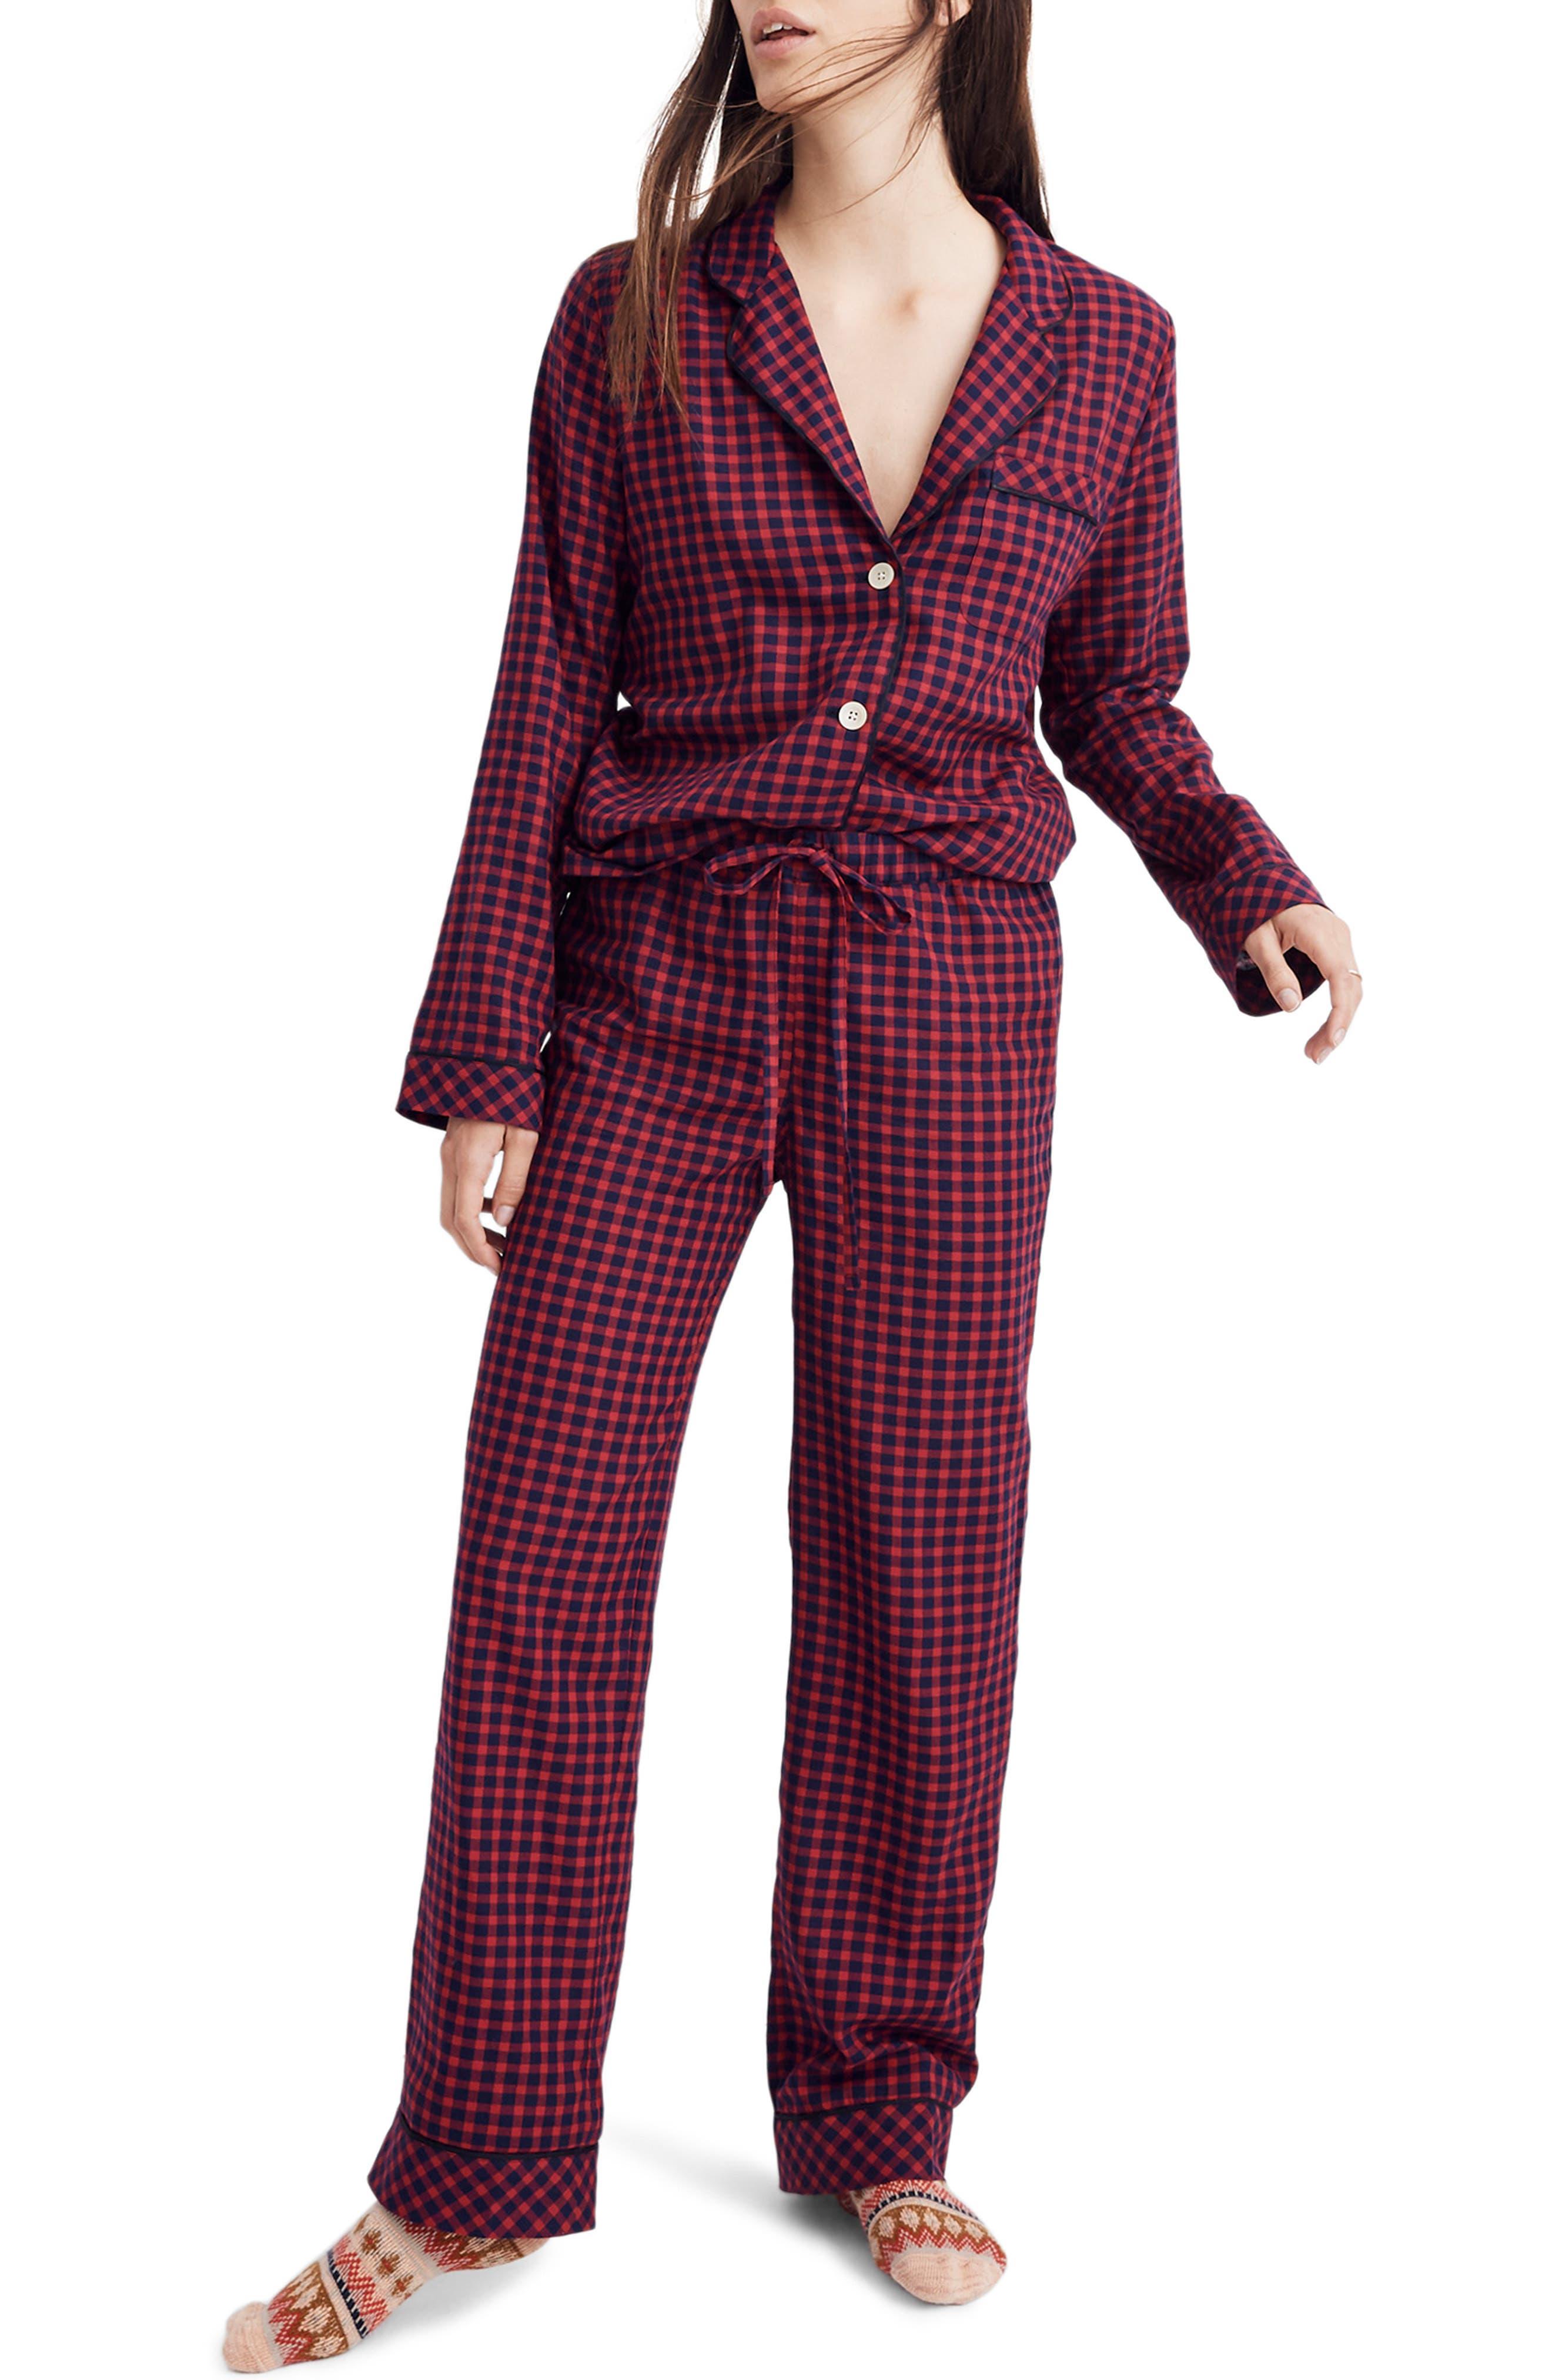 Bedtime Pajama Pants,                             Main thumbnail 1, color,                             CRANBERRY